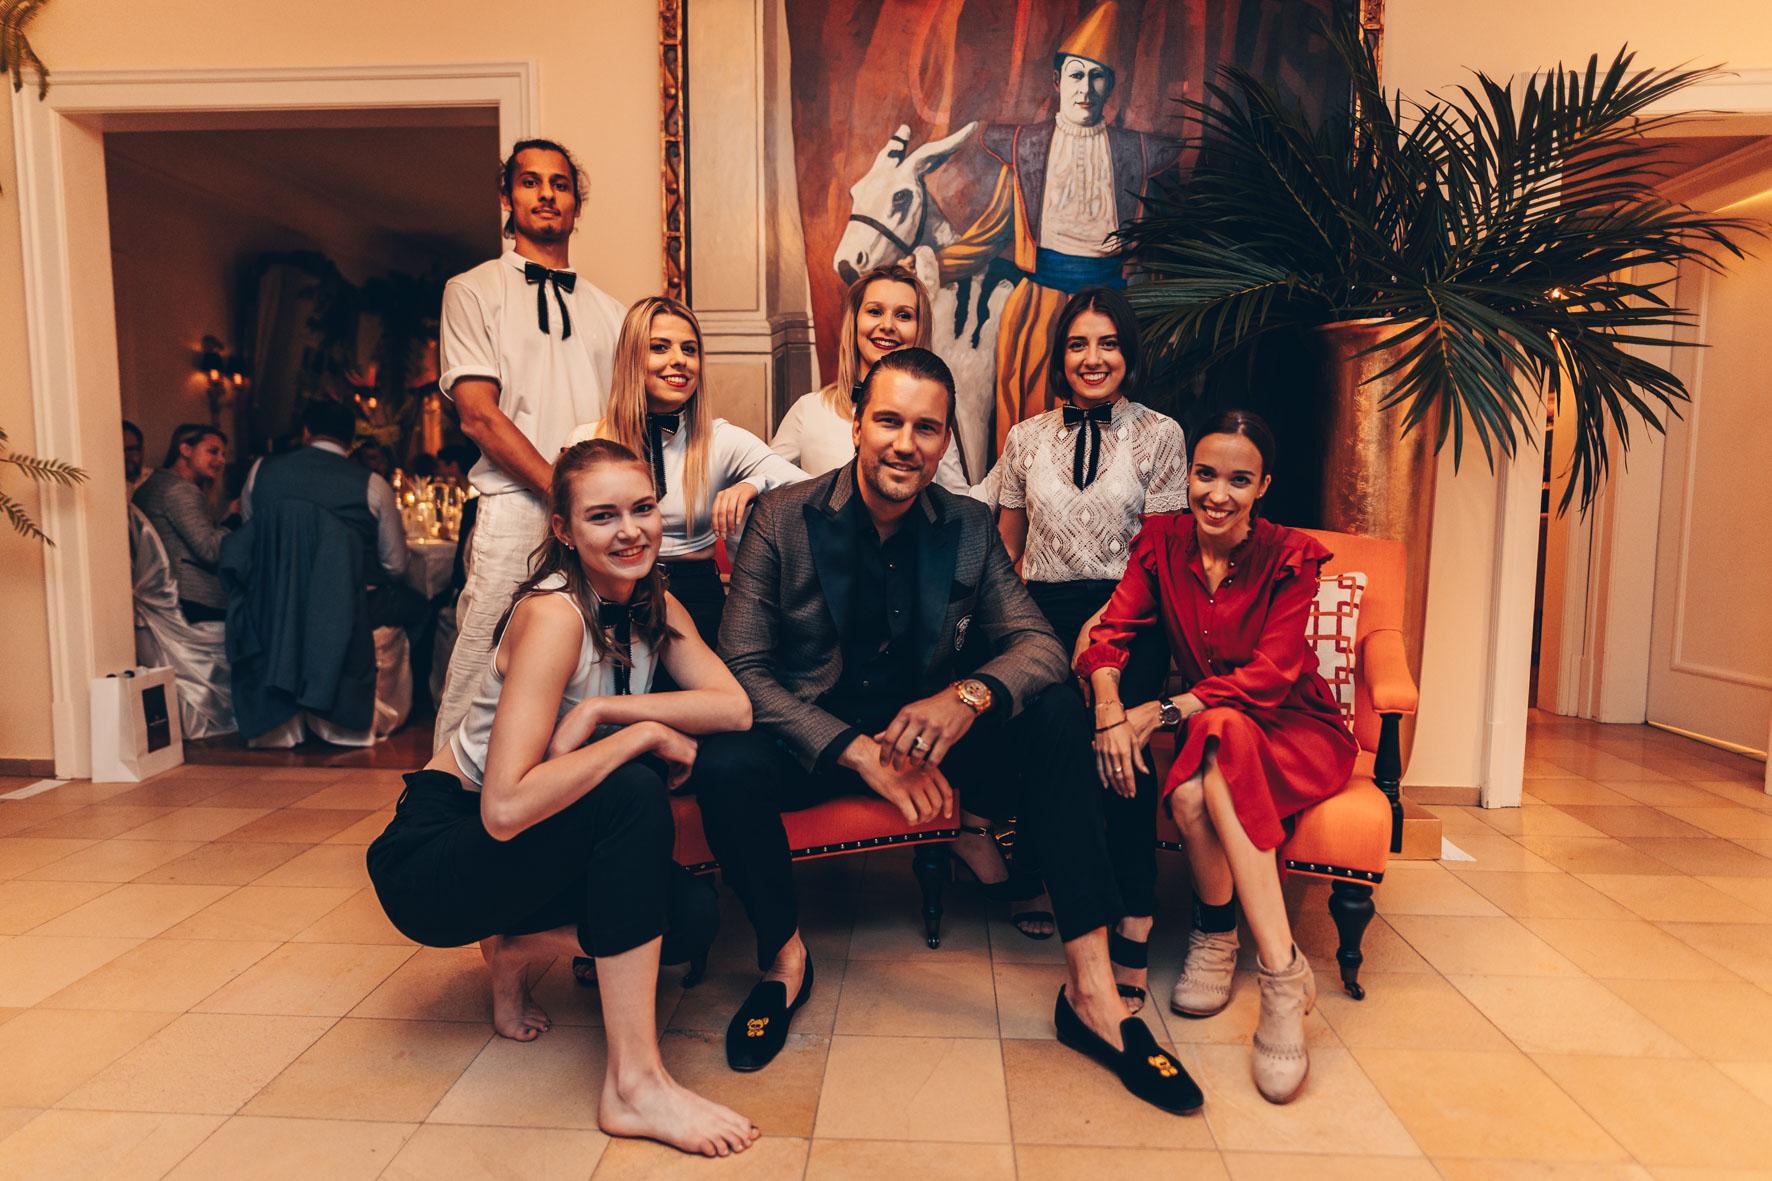 Konrad-lifestyle-art-basel-%22c.f.bucherer%22-2019-122.jpg